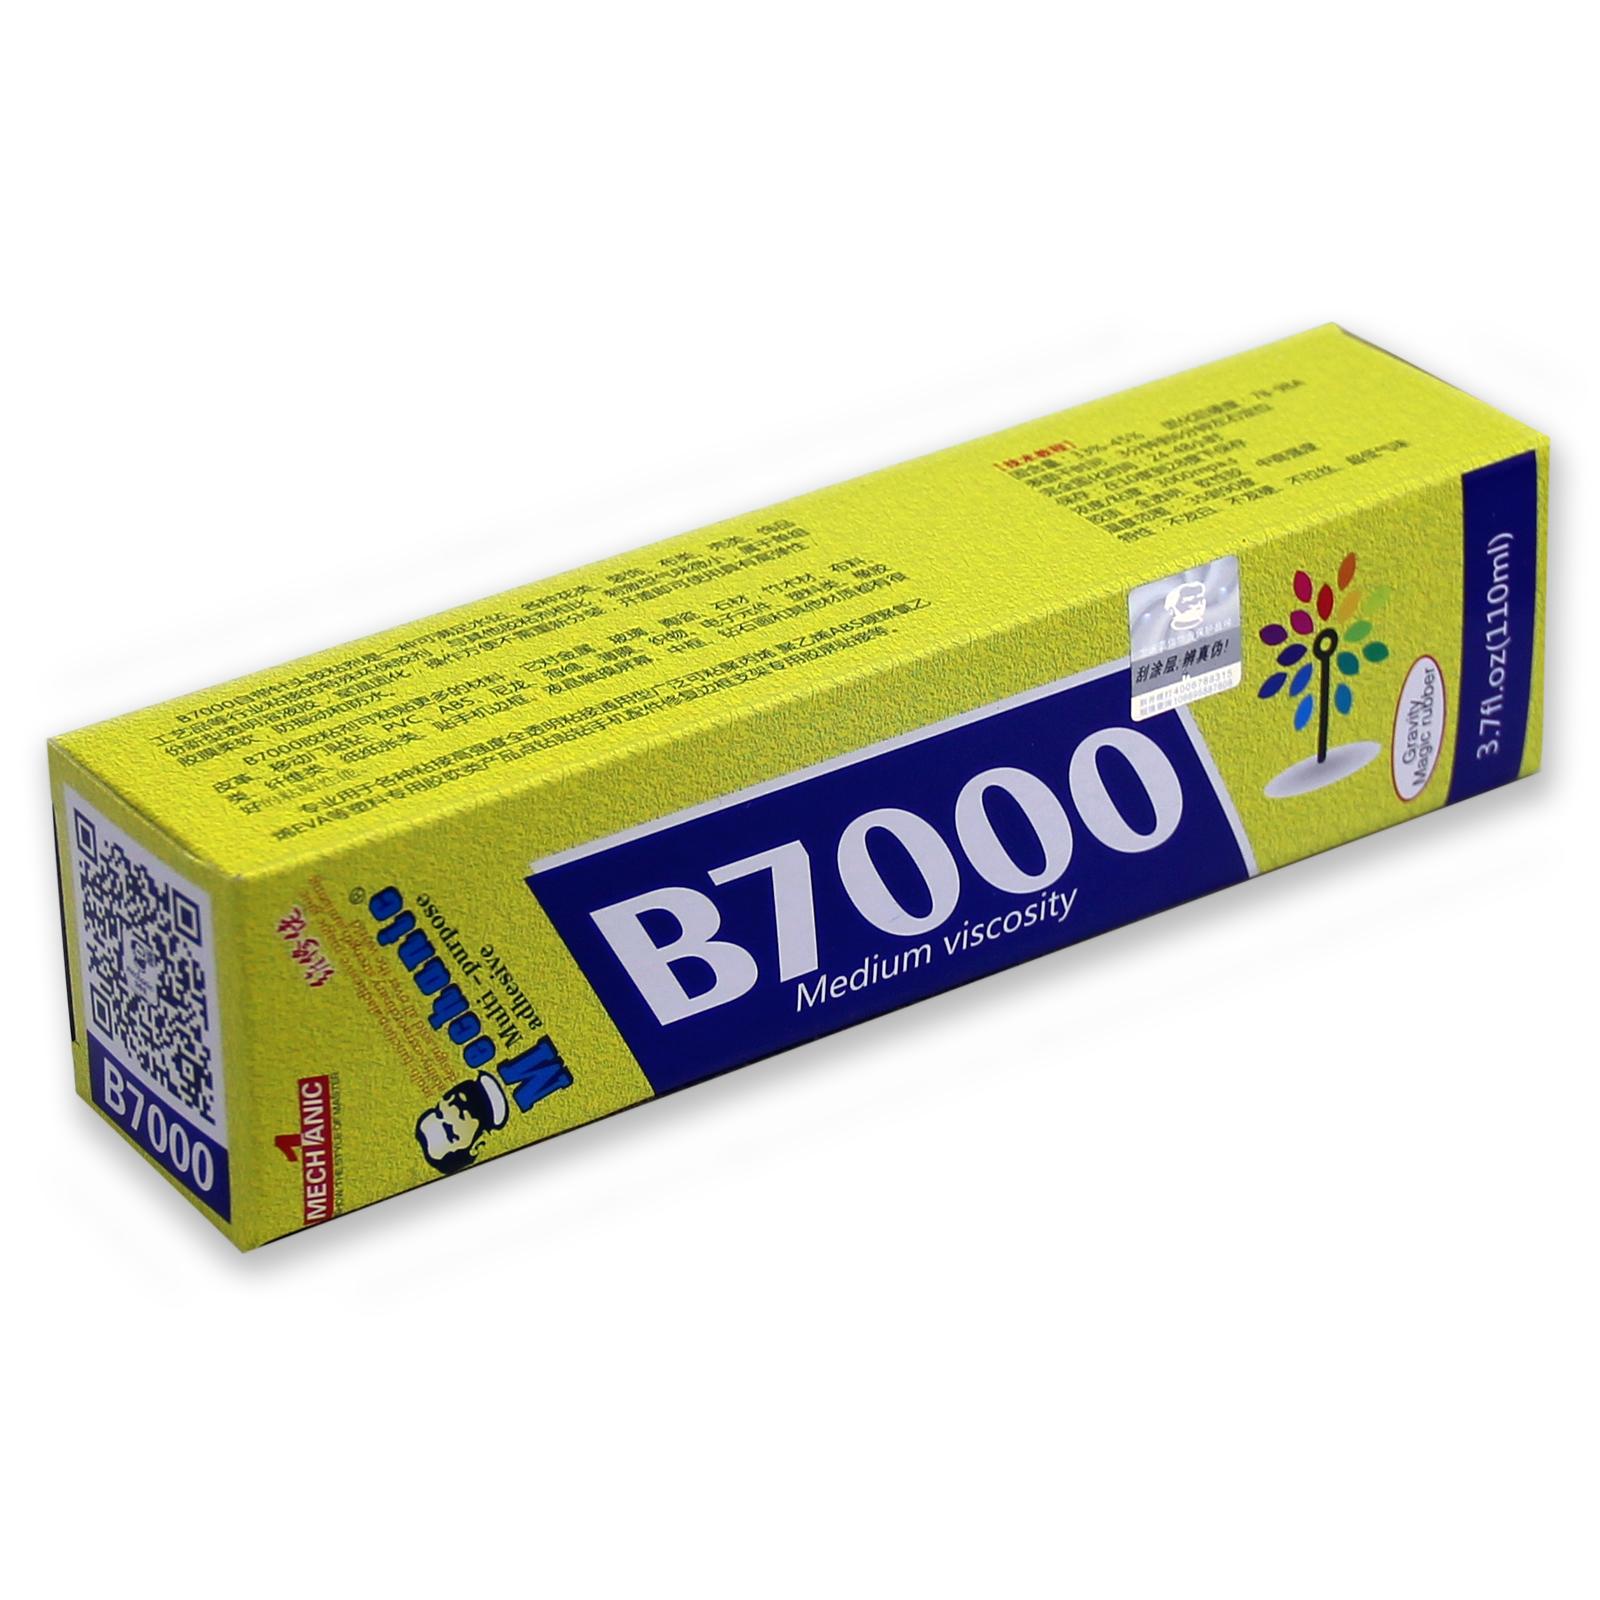 چسب-مایع-110-میلی-لیتر-تعمیرات-گوشی-سورن-موبایل-b7000-touch-lcd-glue-adhesive-50ml-industrial.jpg